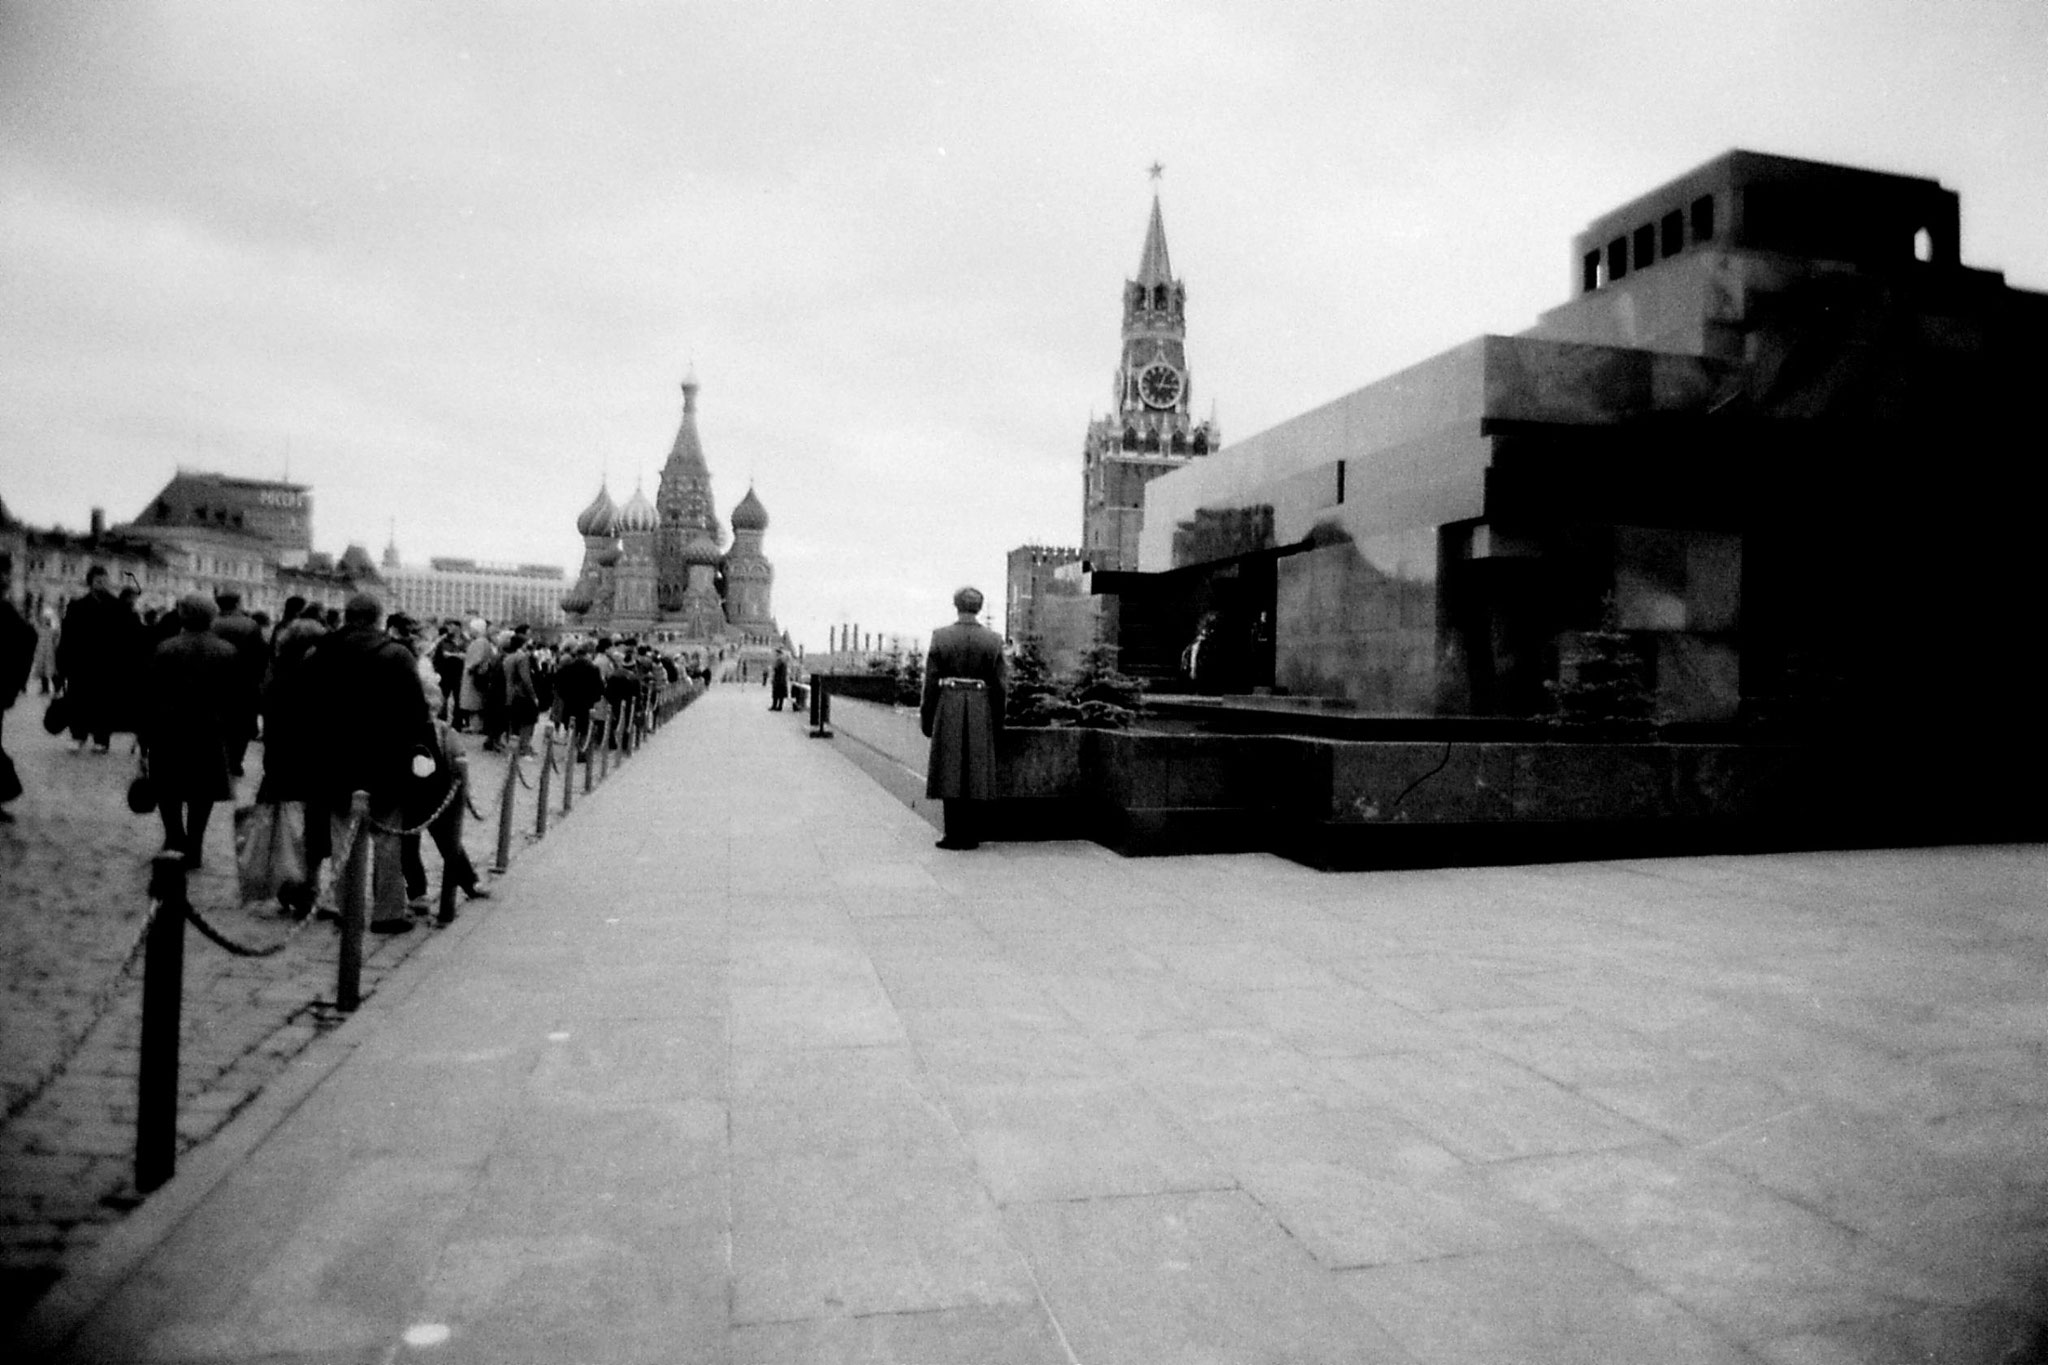 17/10/1988: 2: Lenin tomb and St Basil's